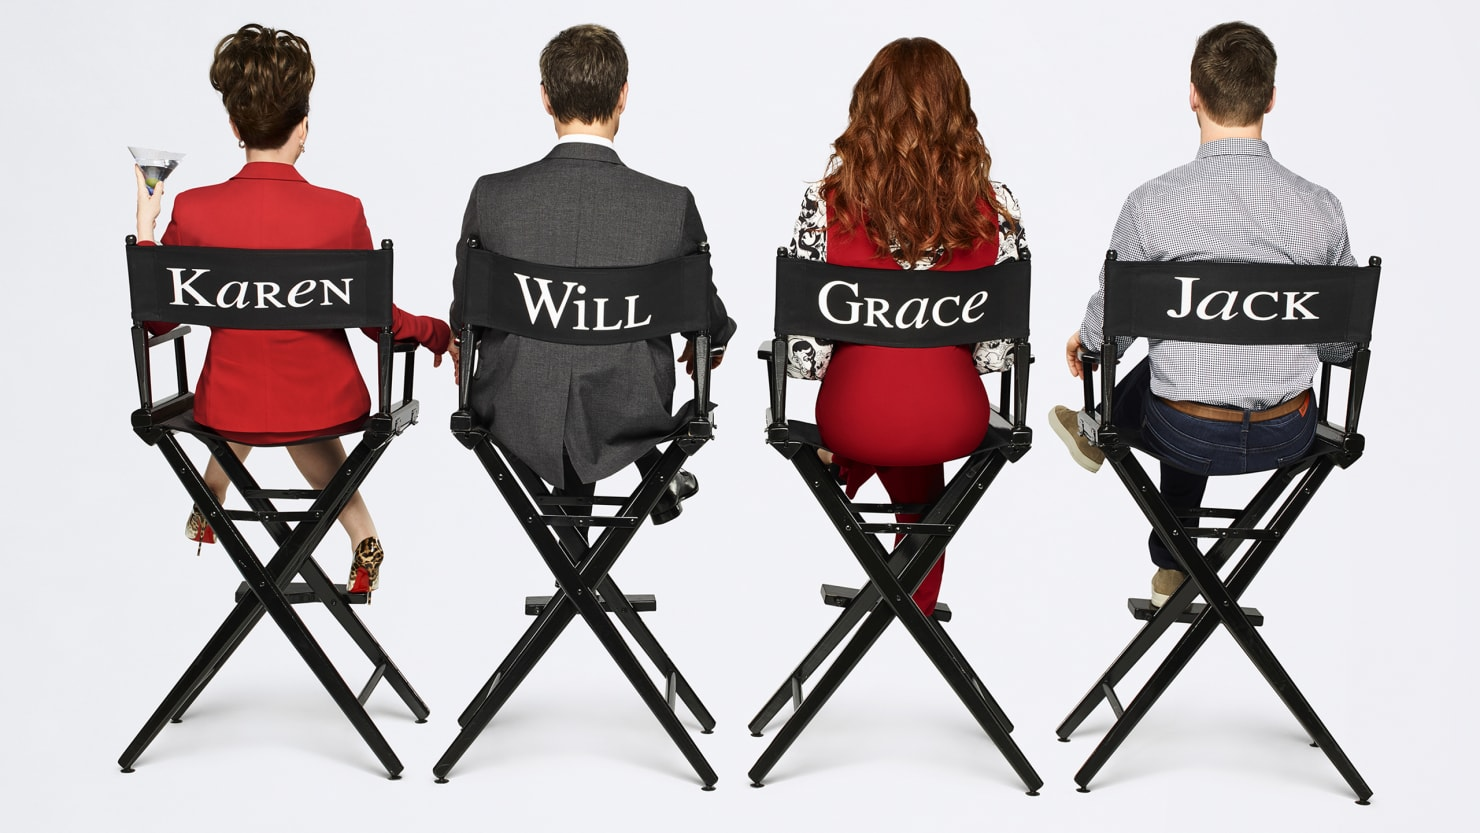 Fallon Grace Tease   Revival Pretending Finale Happened